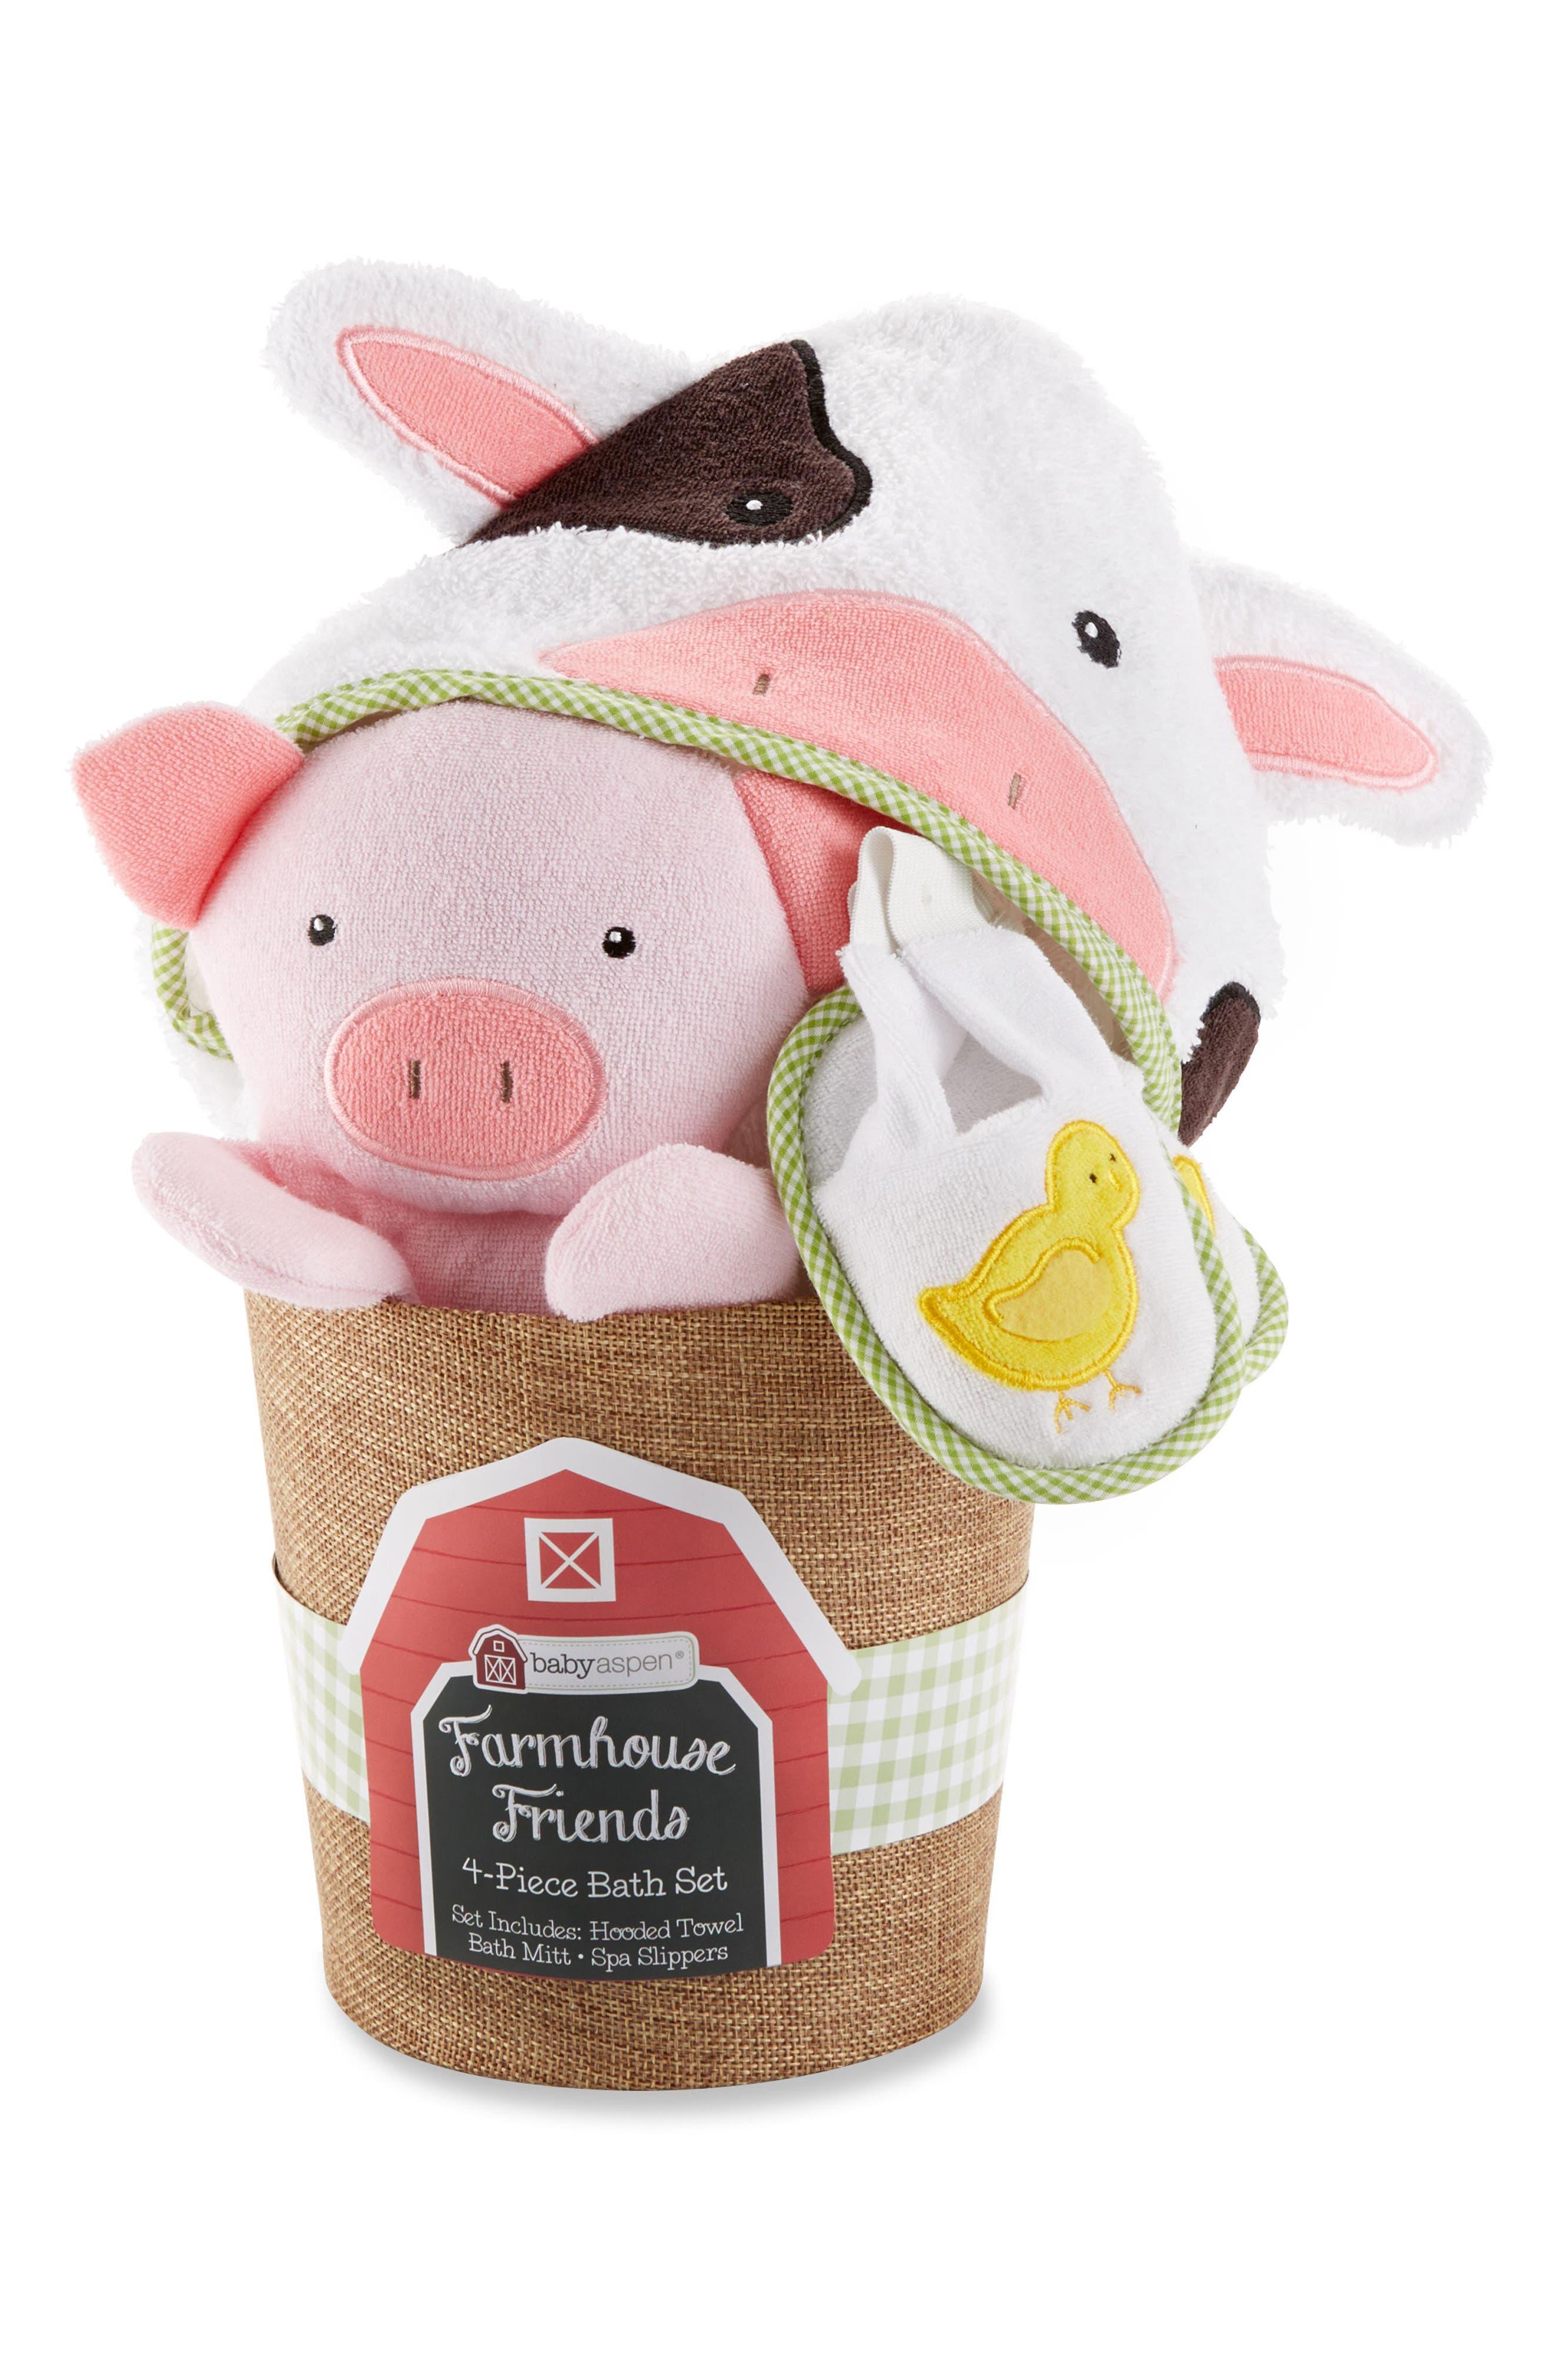 Baby Aspen Farmhouse Friends Hooded Robe, Slippers & Bath Mitt Set (Baby)